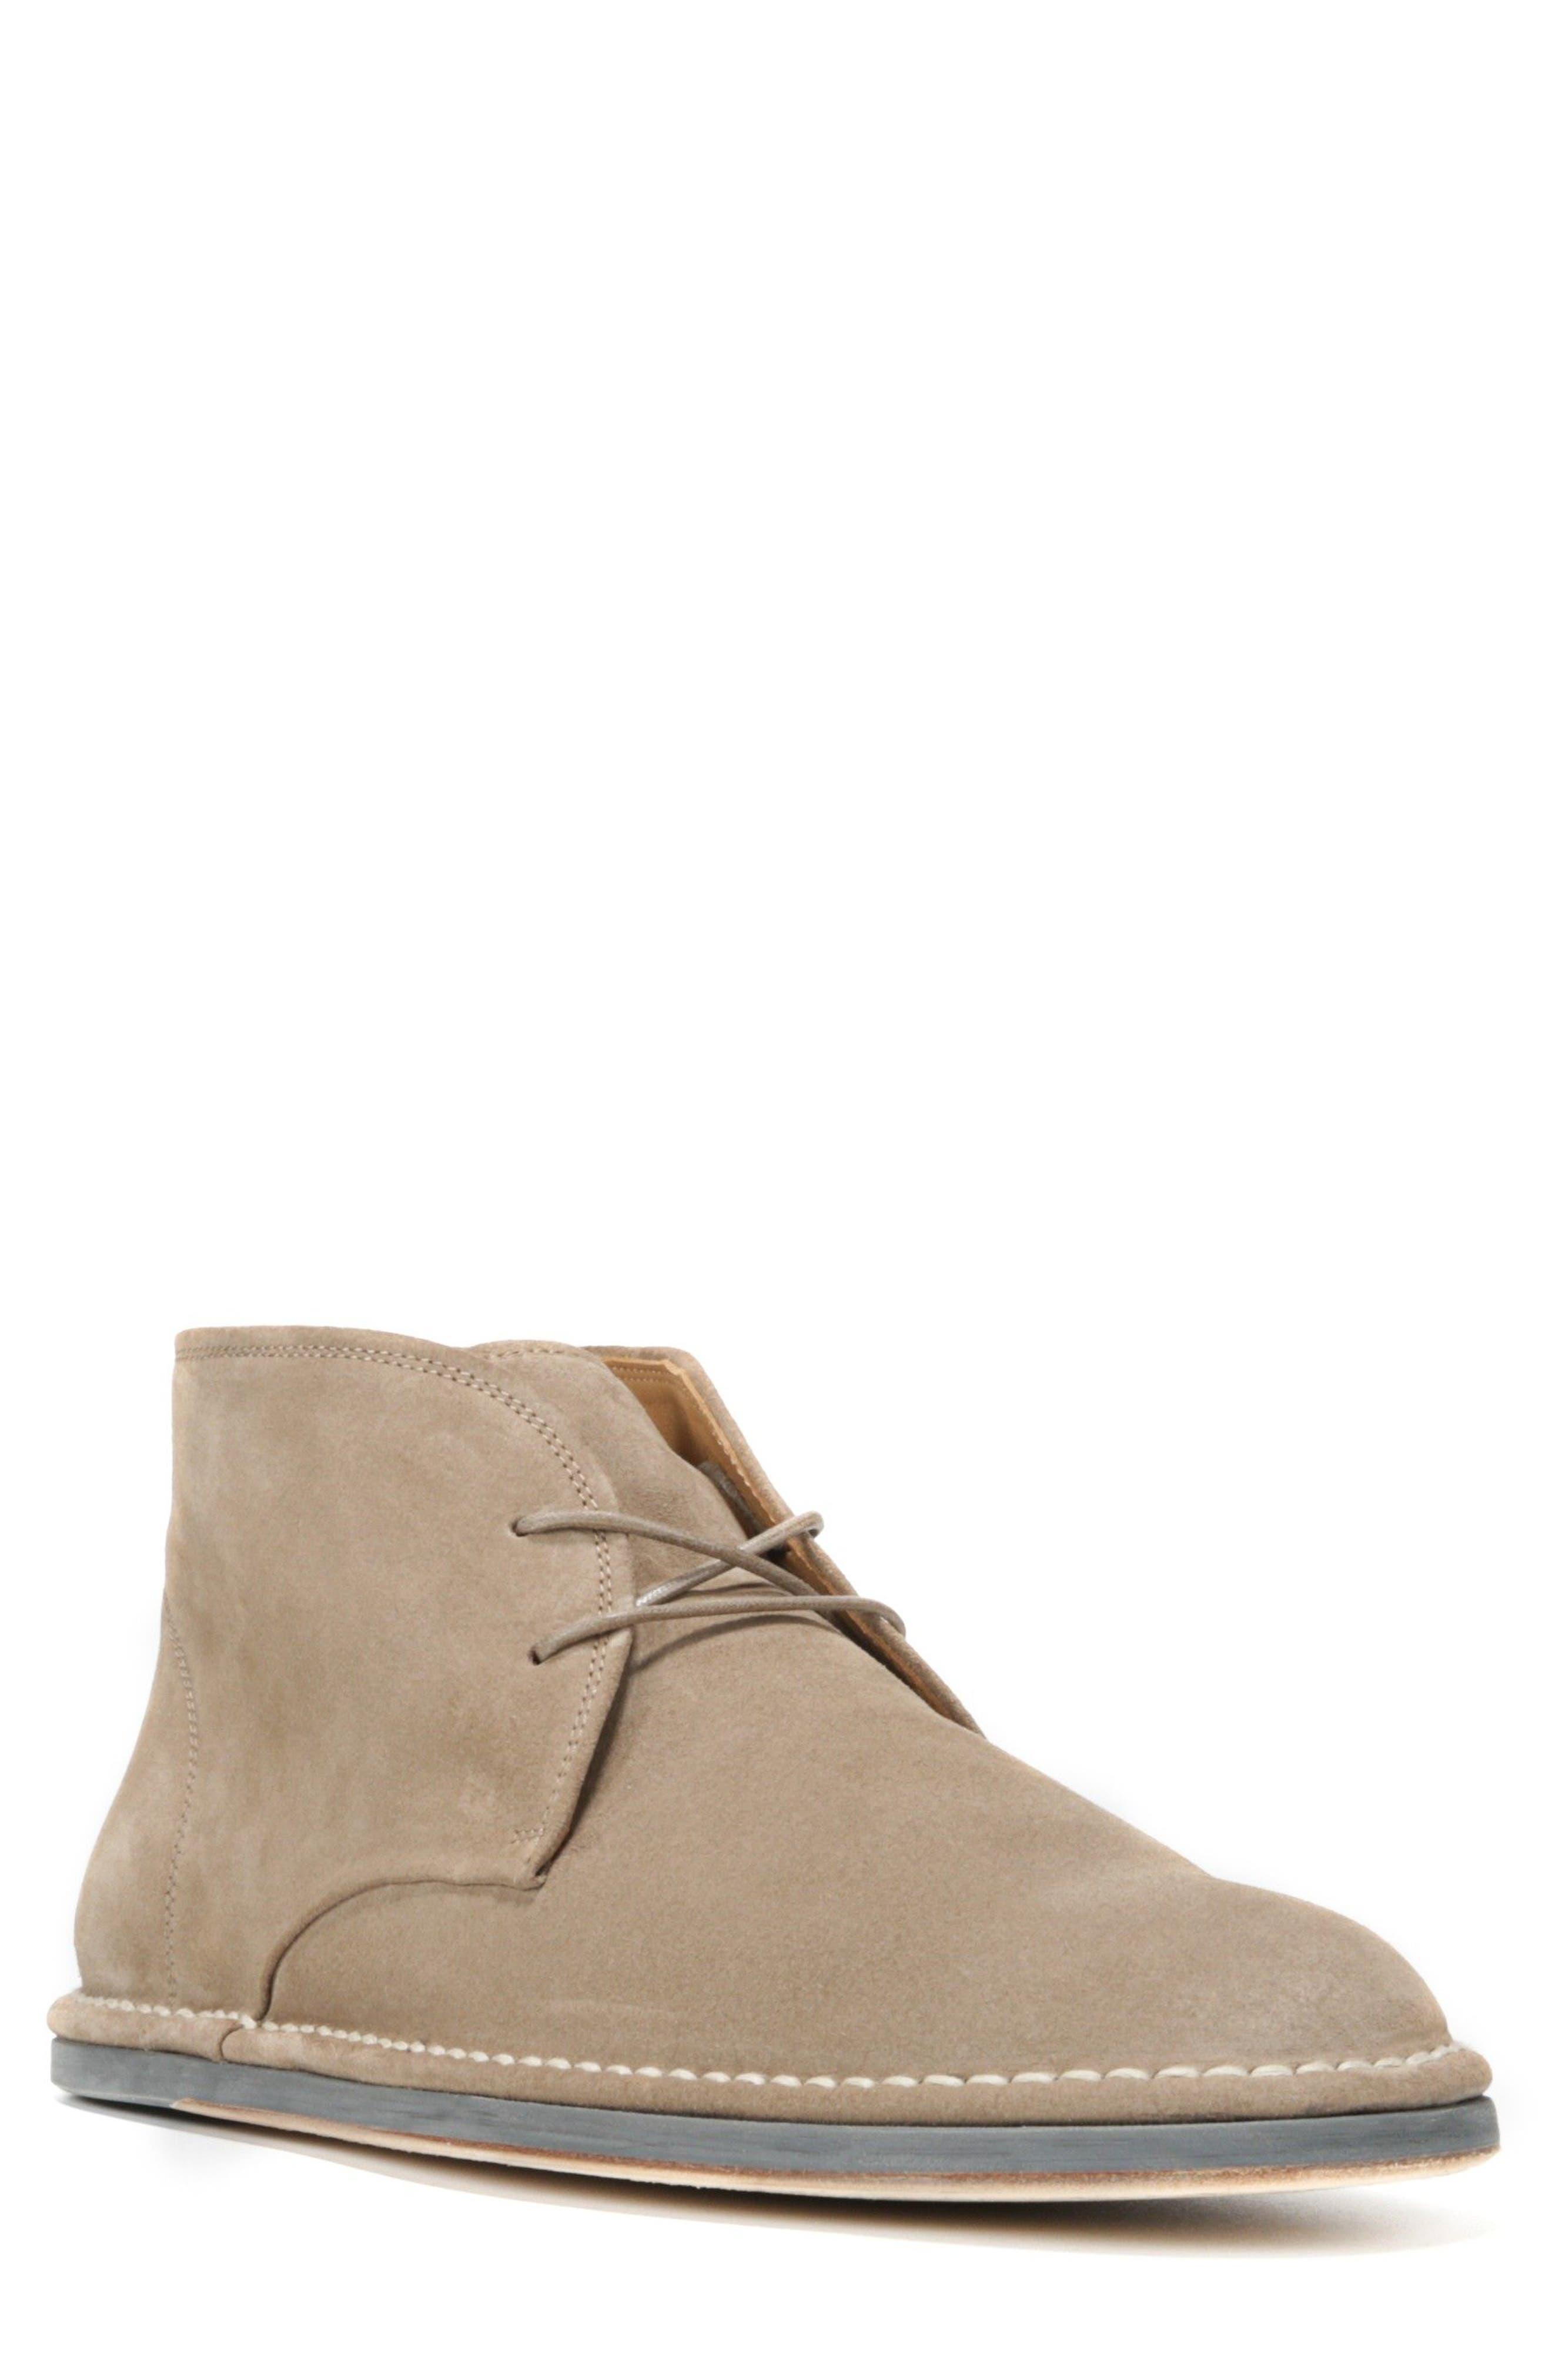 Ramsey Chukka Boot,                         Main,                         color, Flint Suede